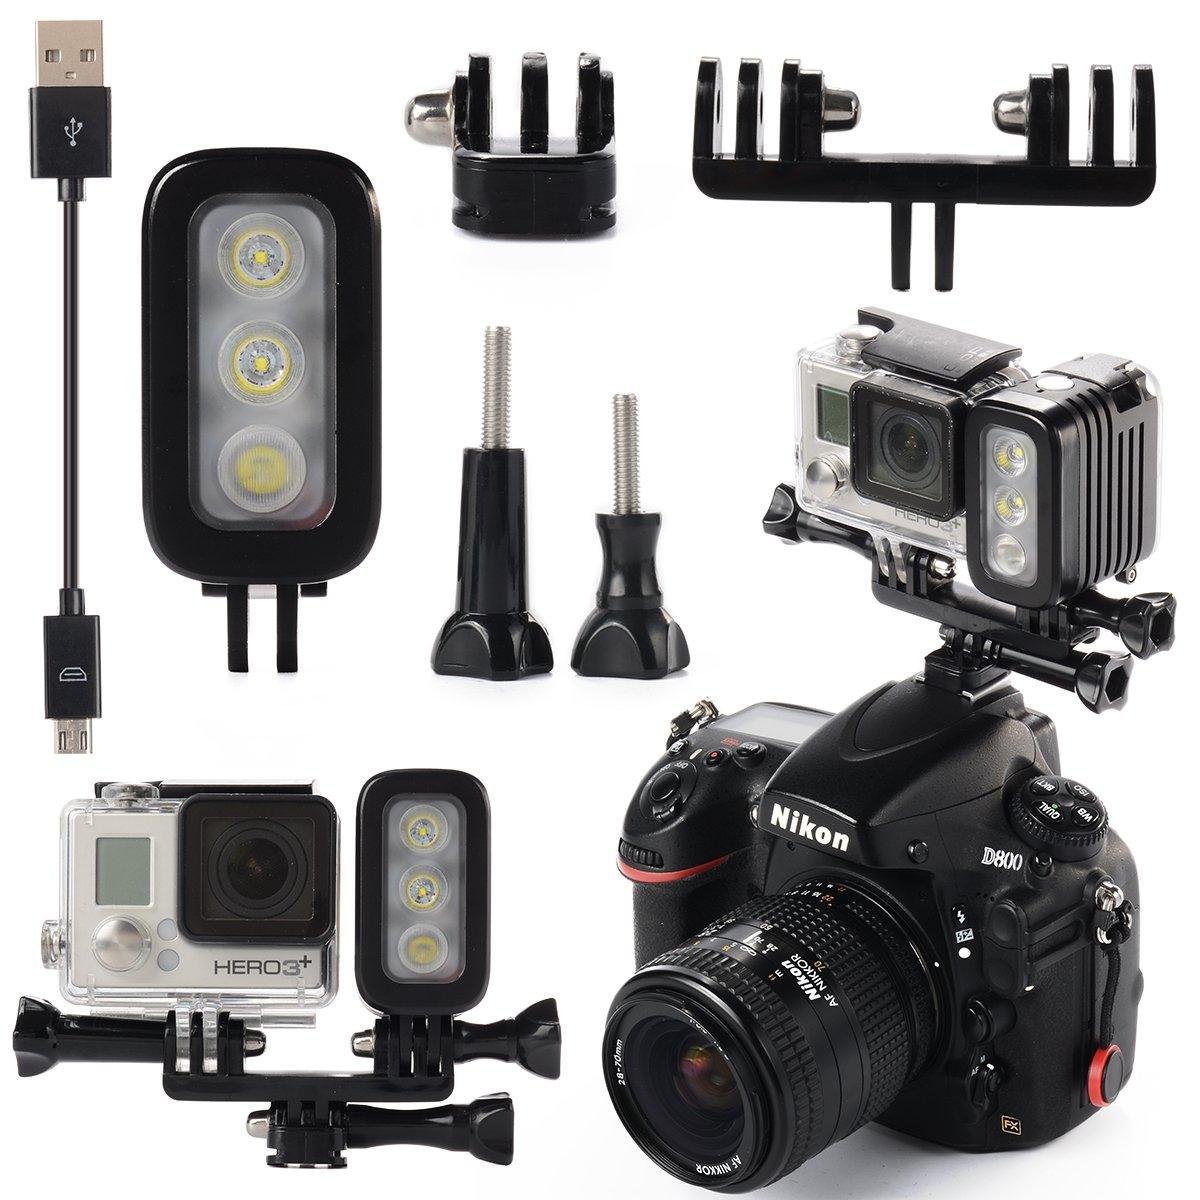 XCSOURCE Impermeabile Spot LED Spot Flash Light per GoPro Hero 4 Sessione 3+ Camera xiaomi OS431